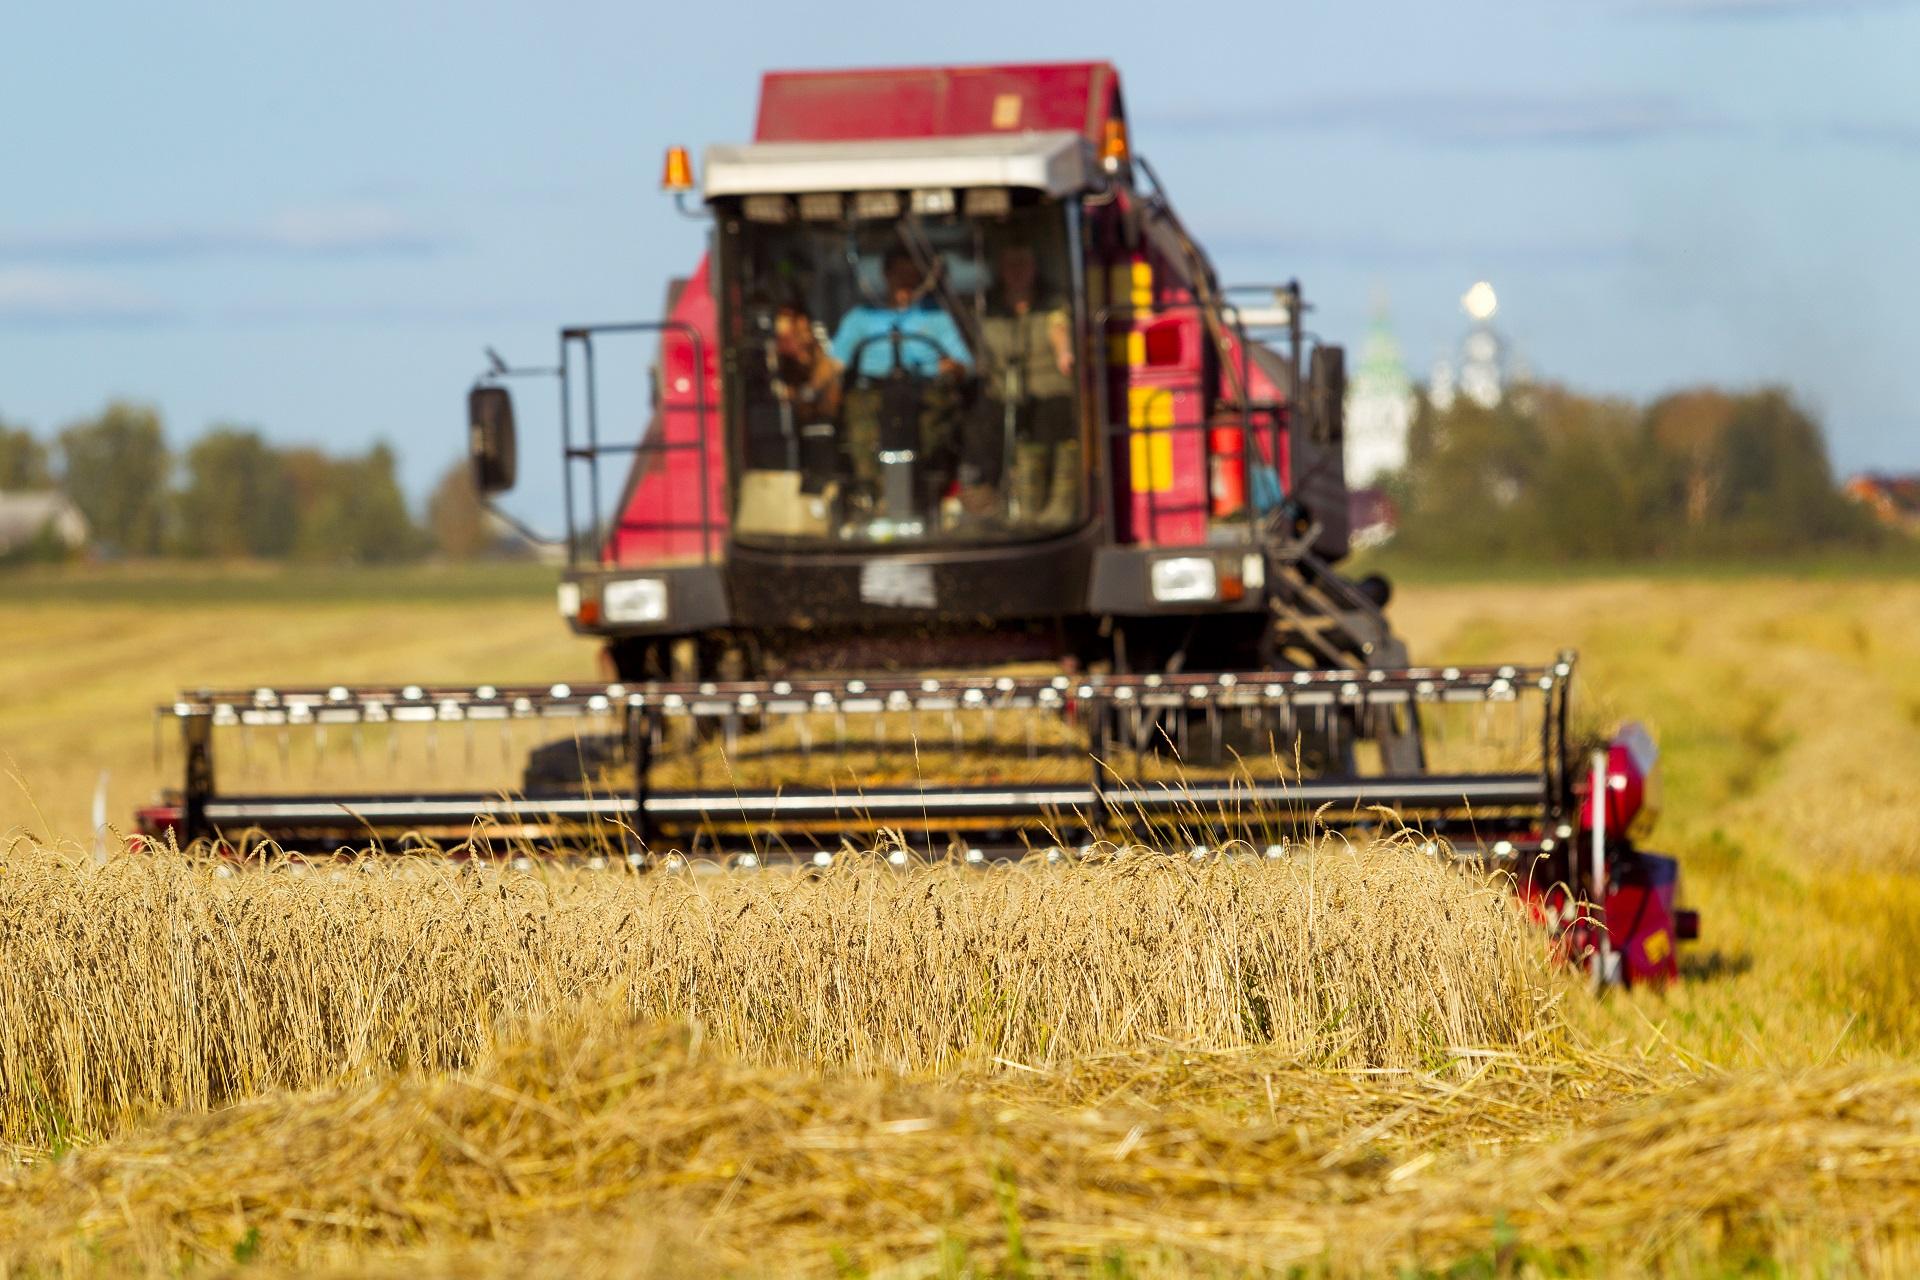 Coperture per l'agricoltura